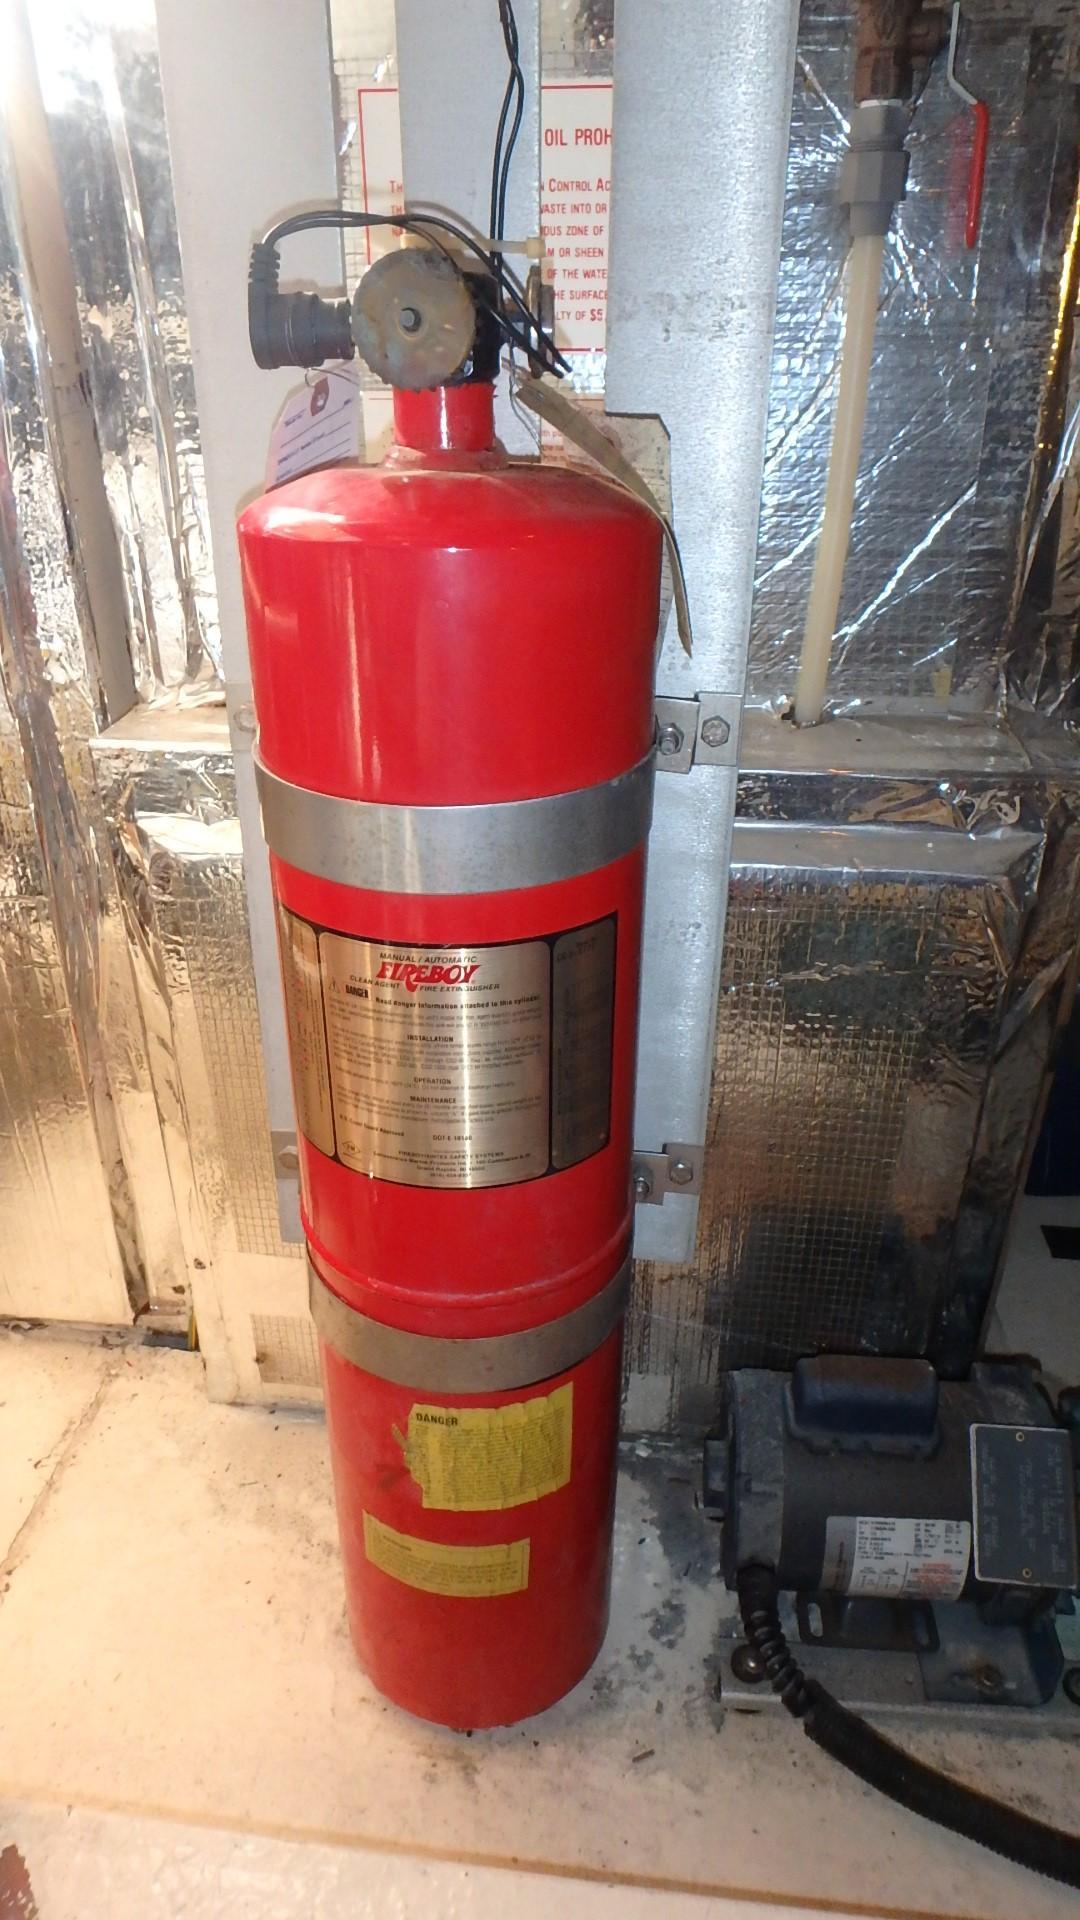 Navigator 4800 CLASSIC - Fire Ext. System